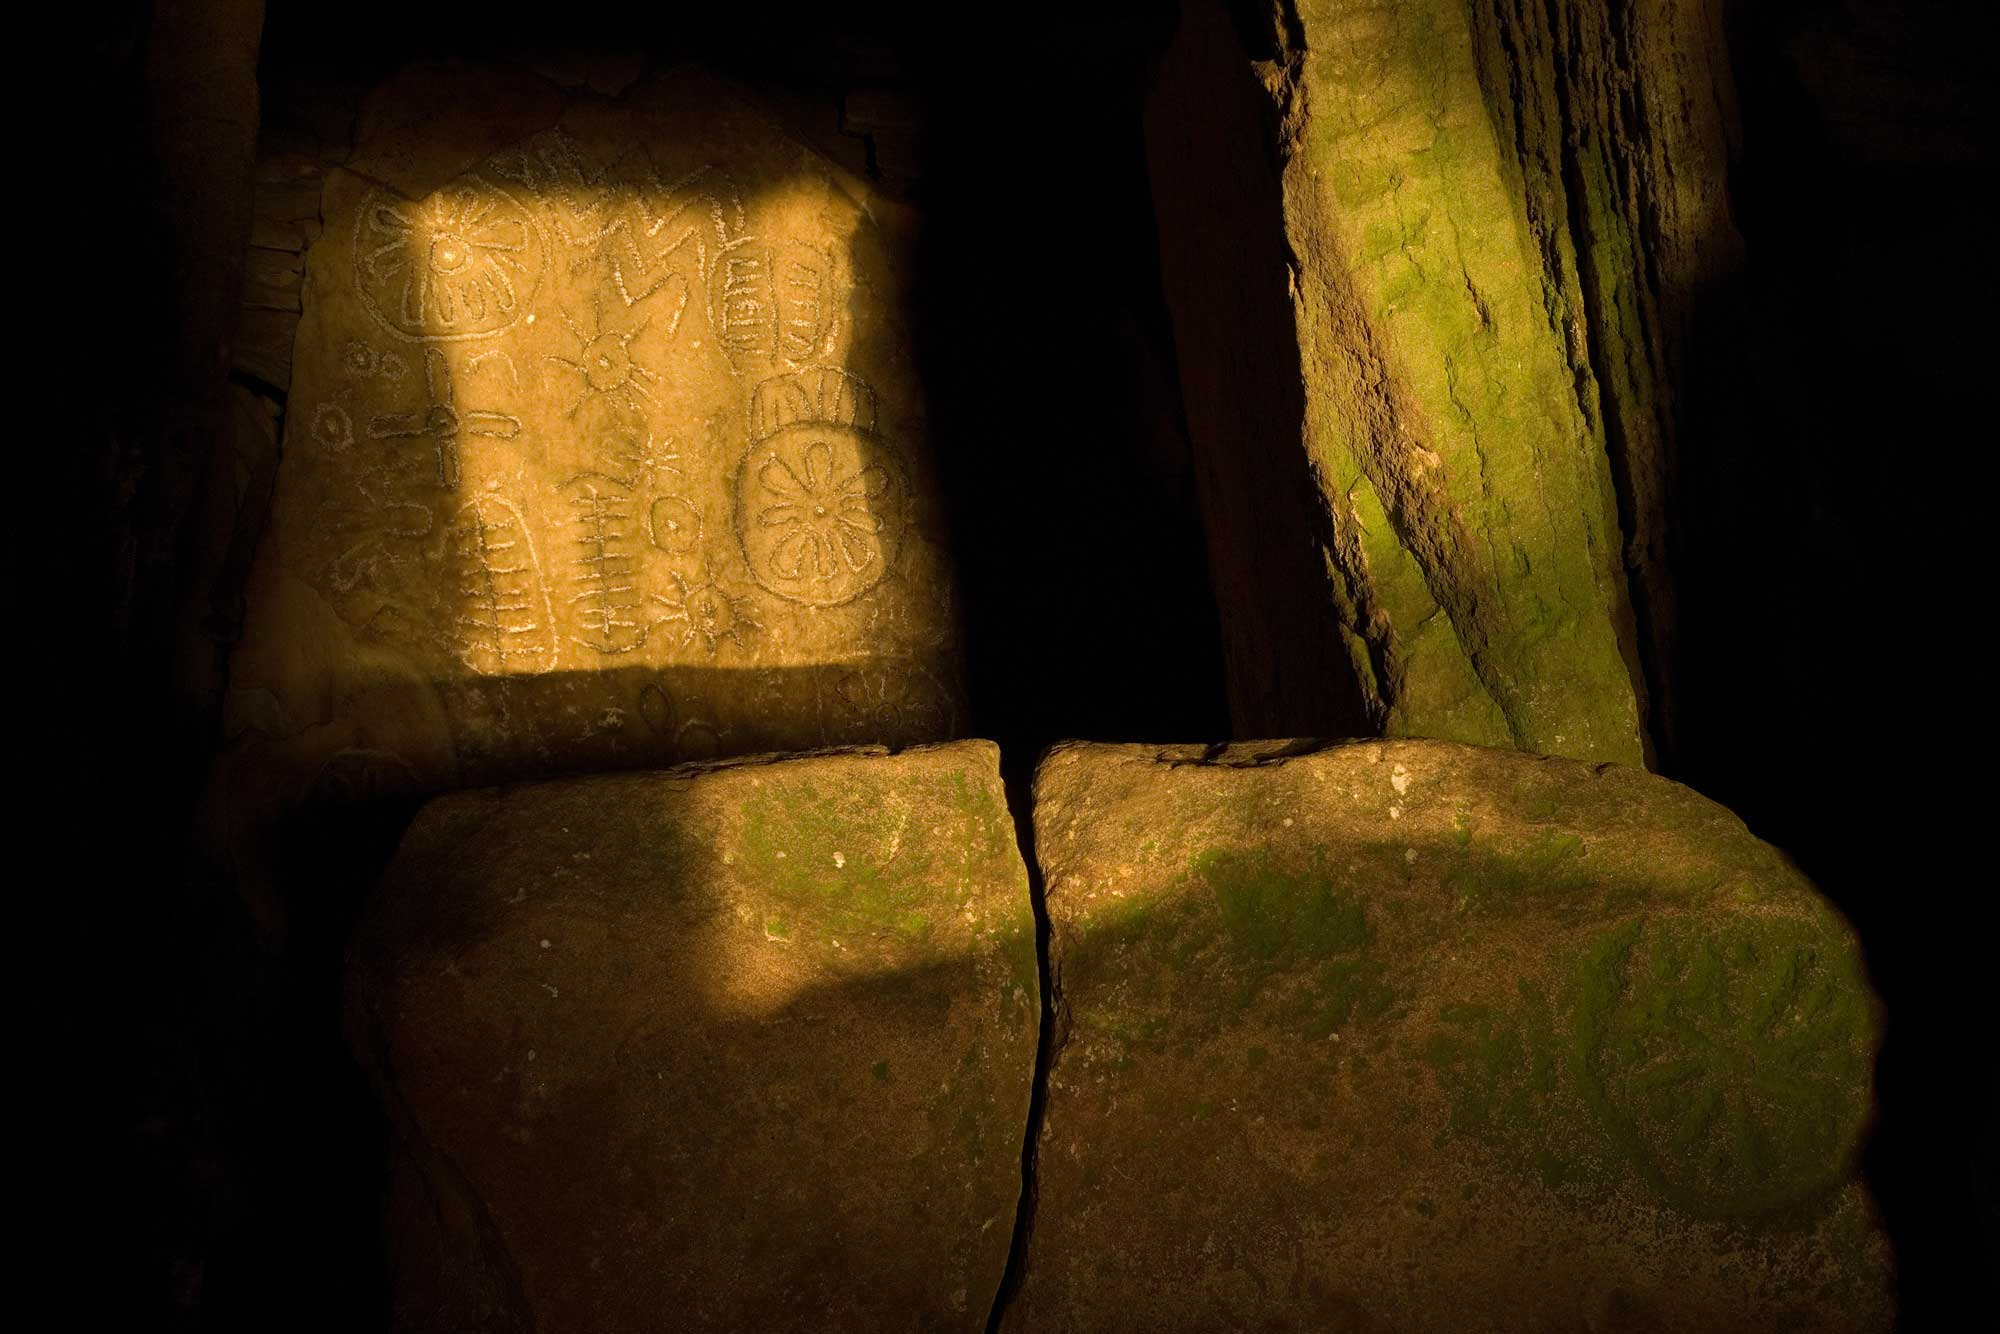 Equinox at Loughcrew Cairn